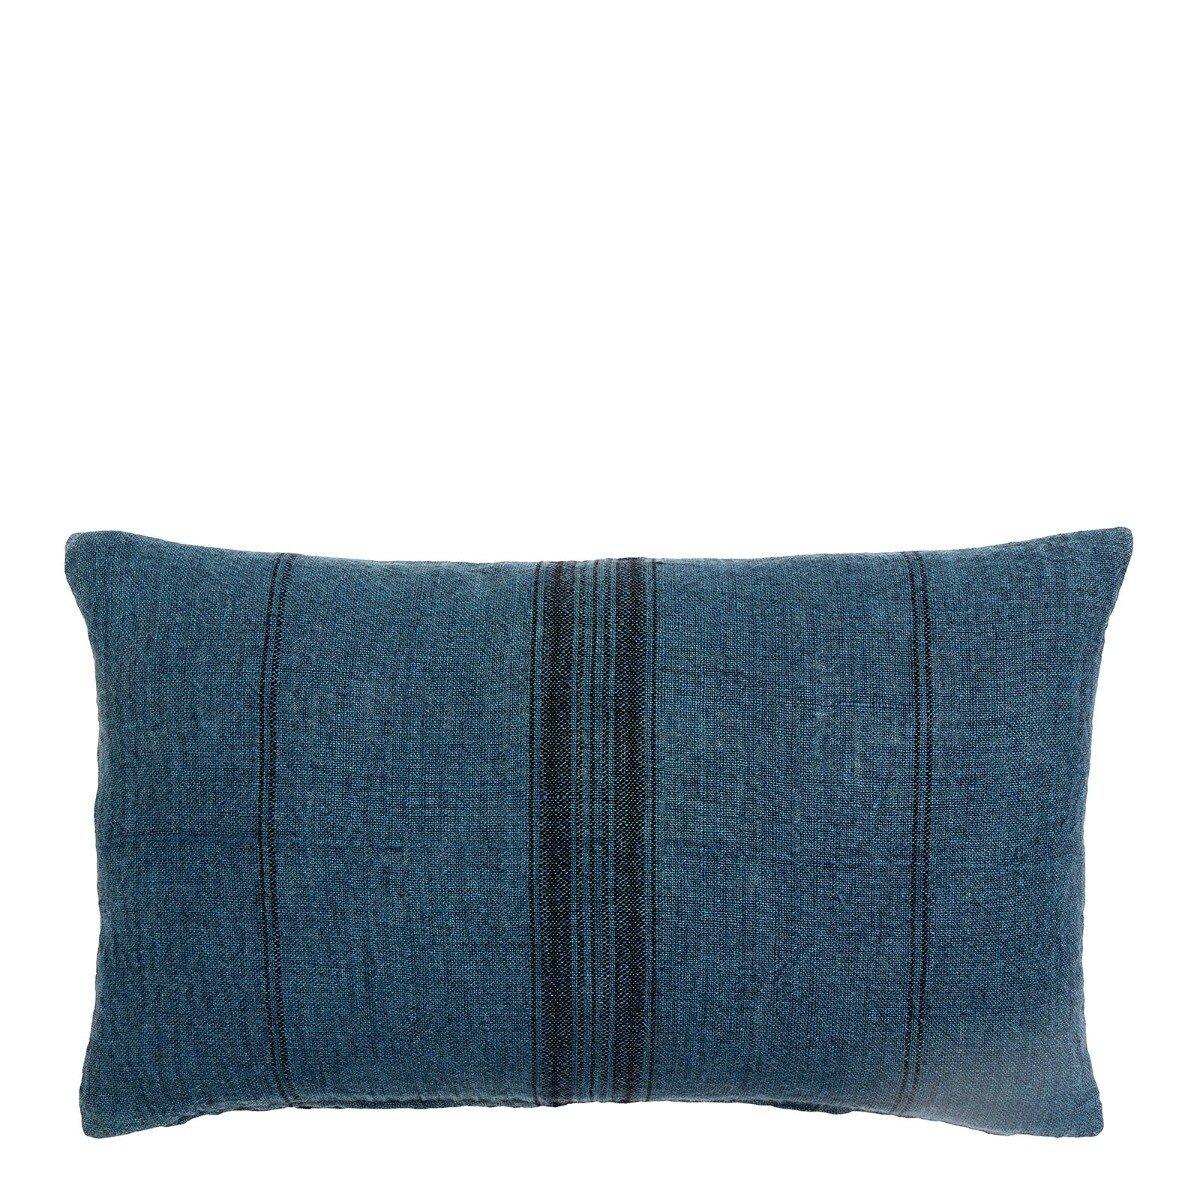 Nordal kussenhoes gestreept linnen blauw/zwart 40 x 65